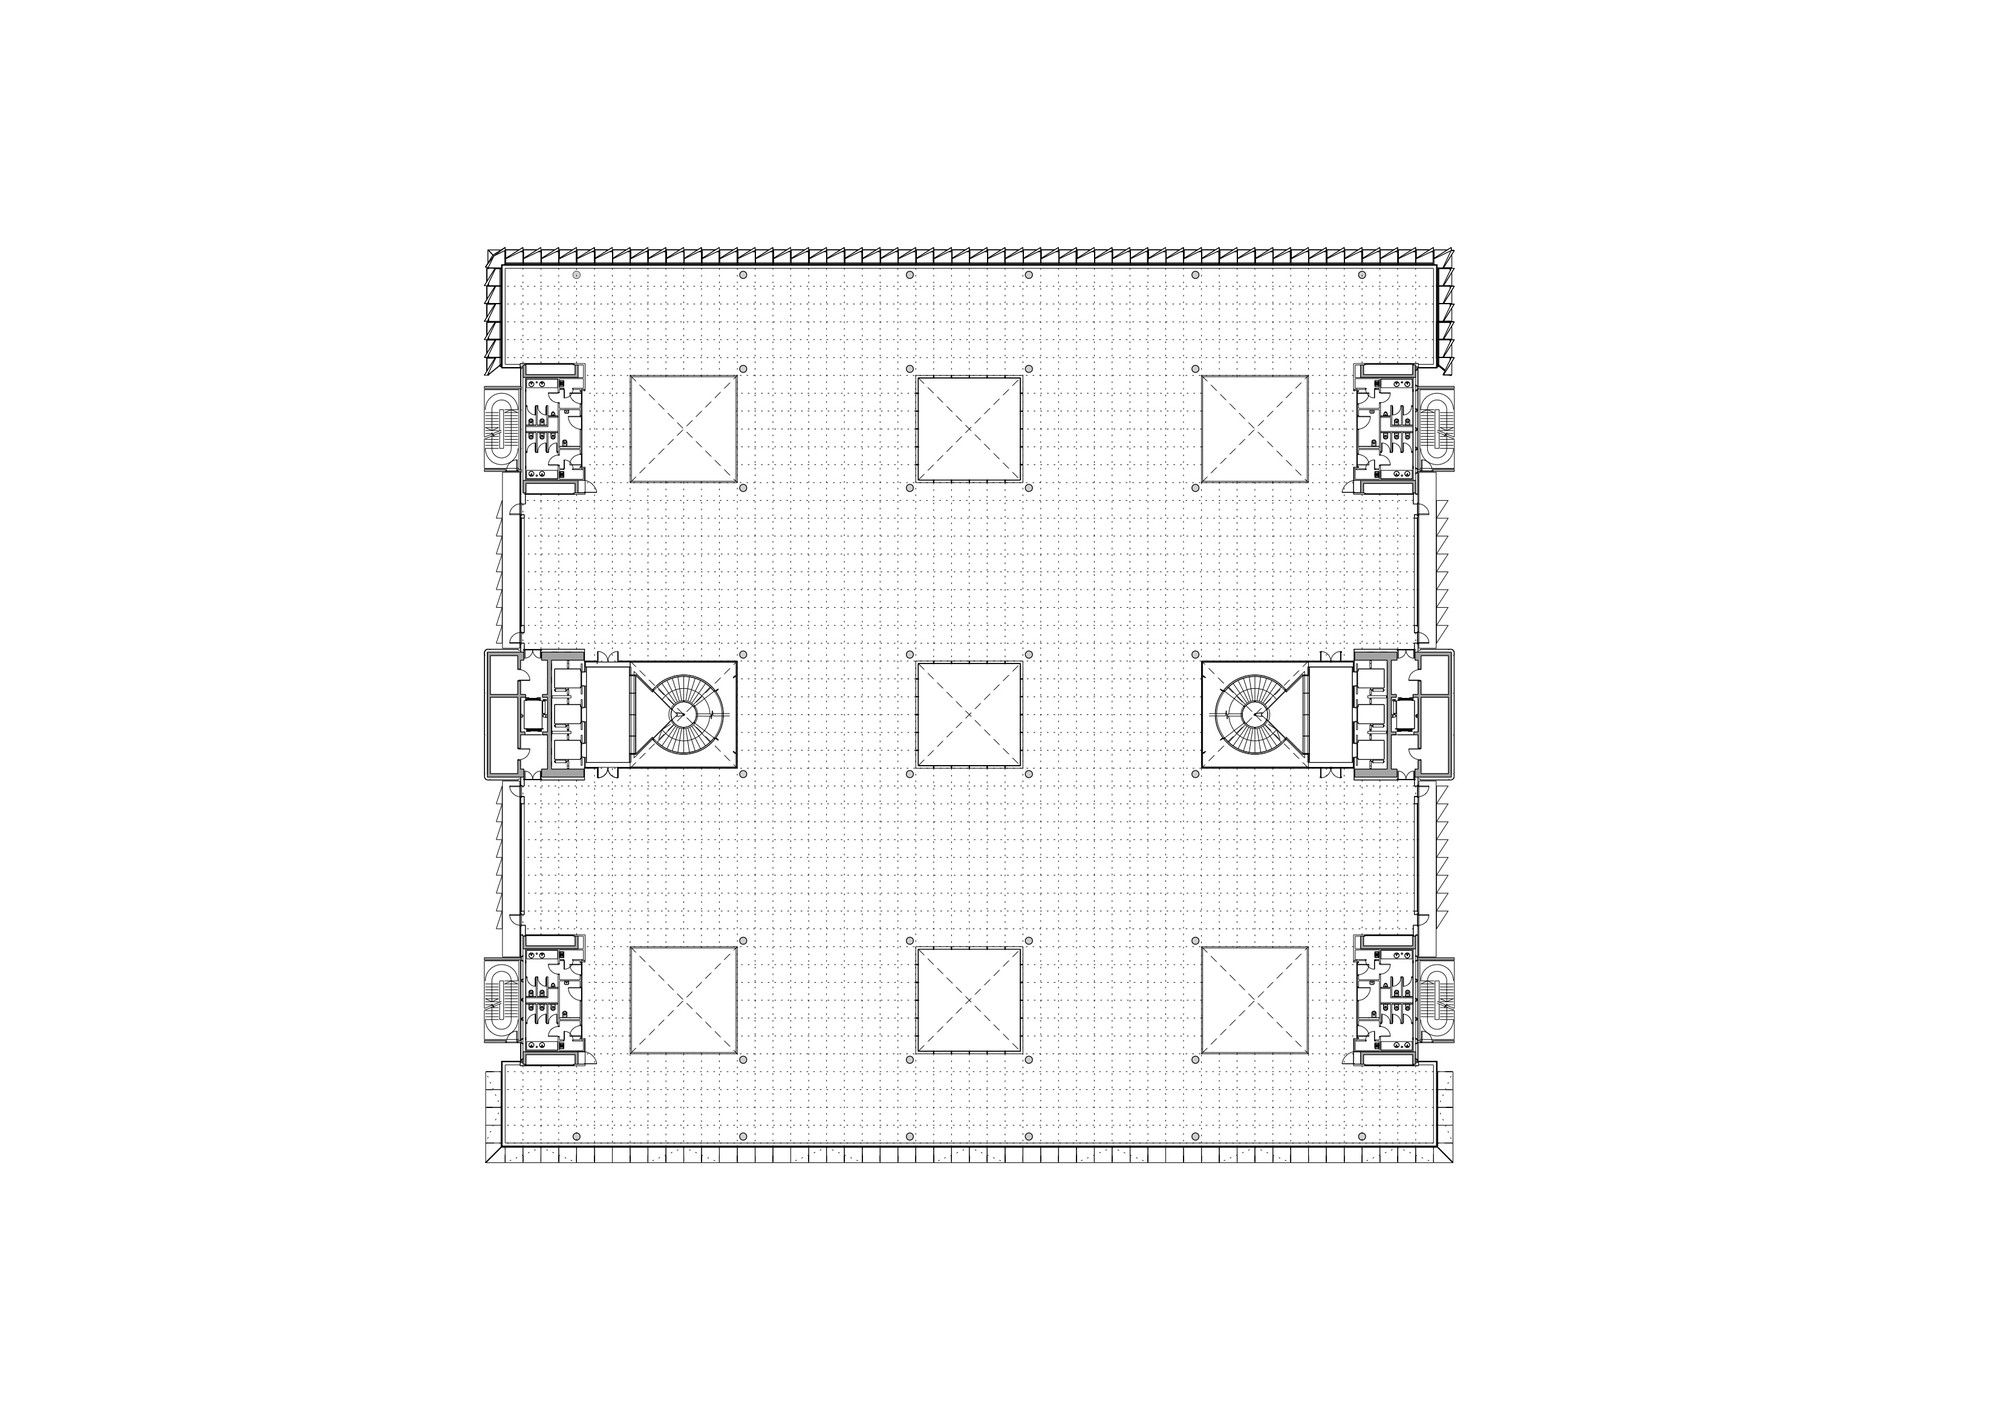 Siemens HQ in Masdar City Exterior modlar – Siemens Site Planning